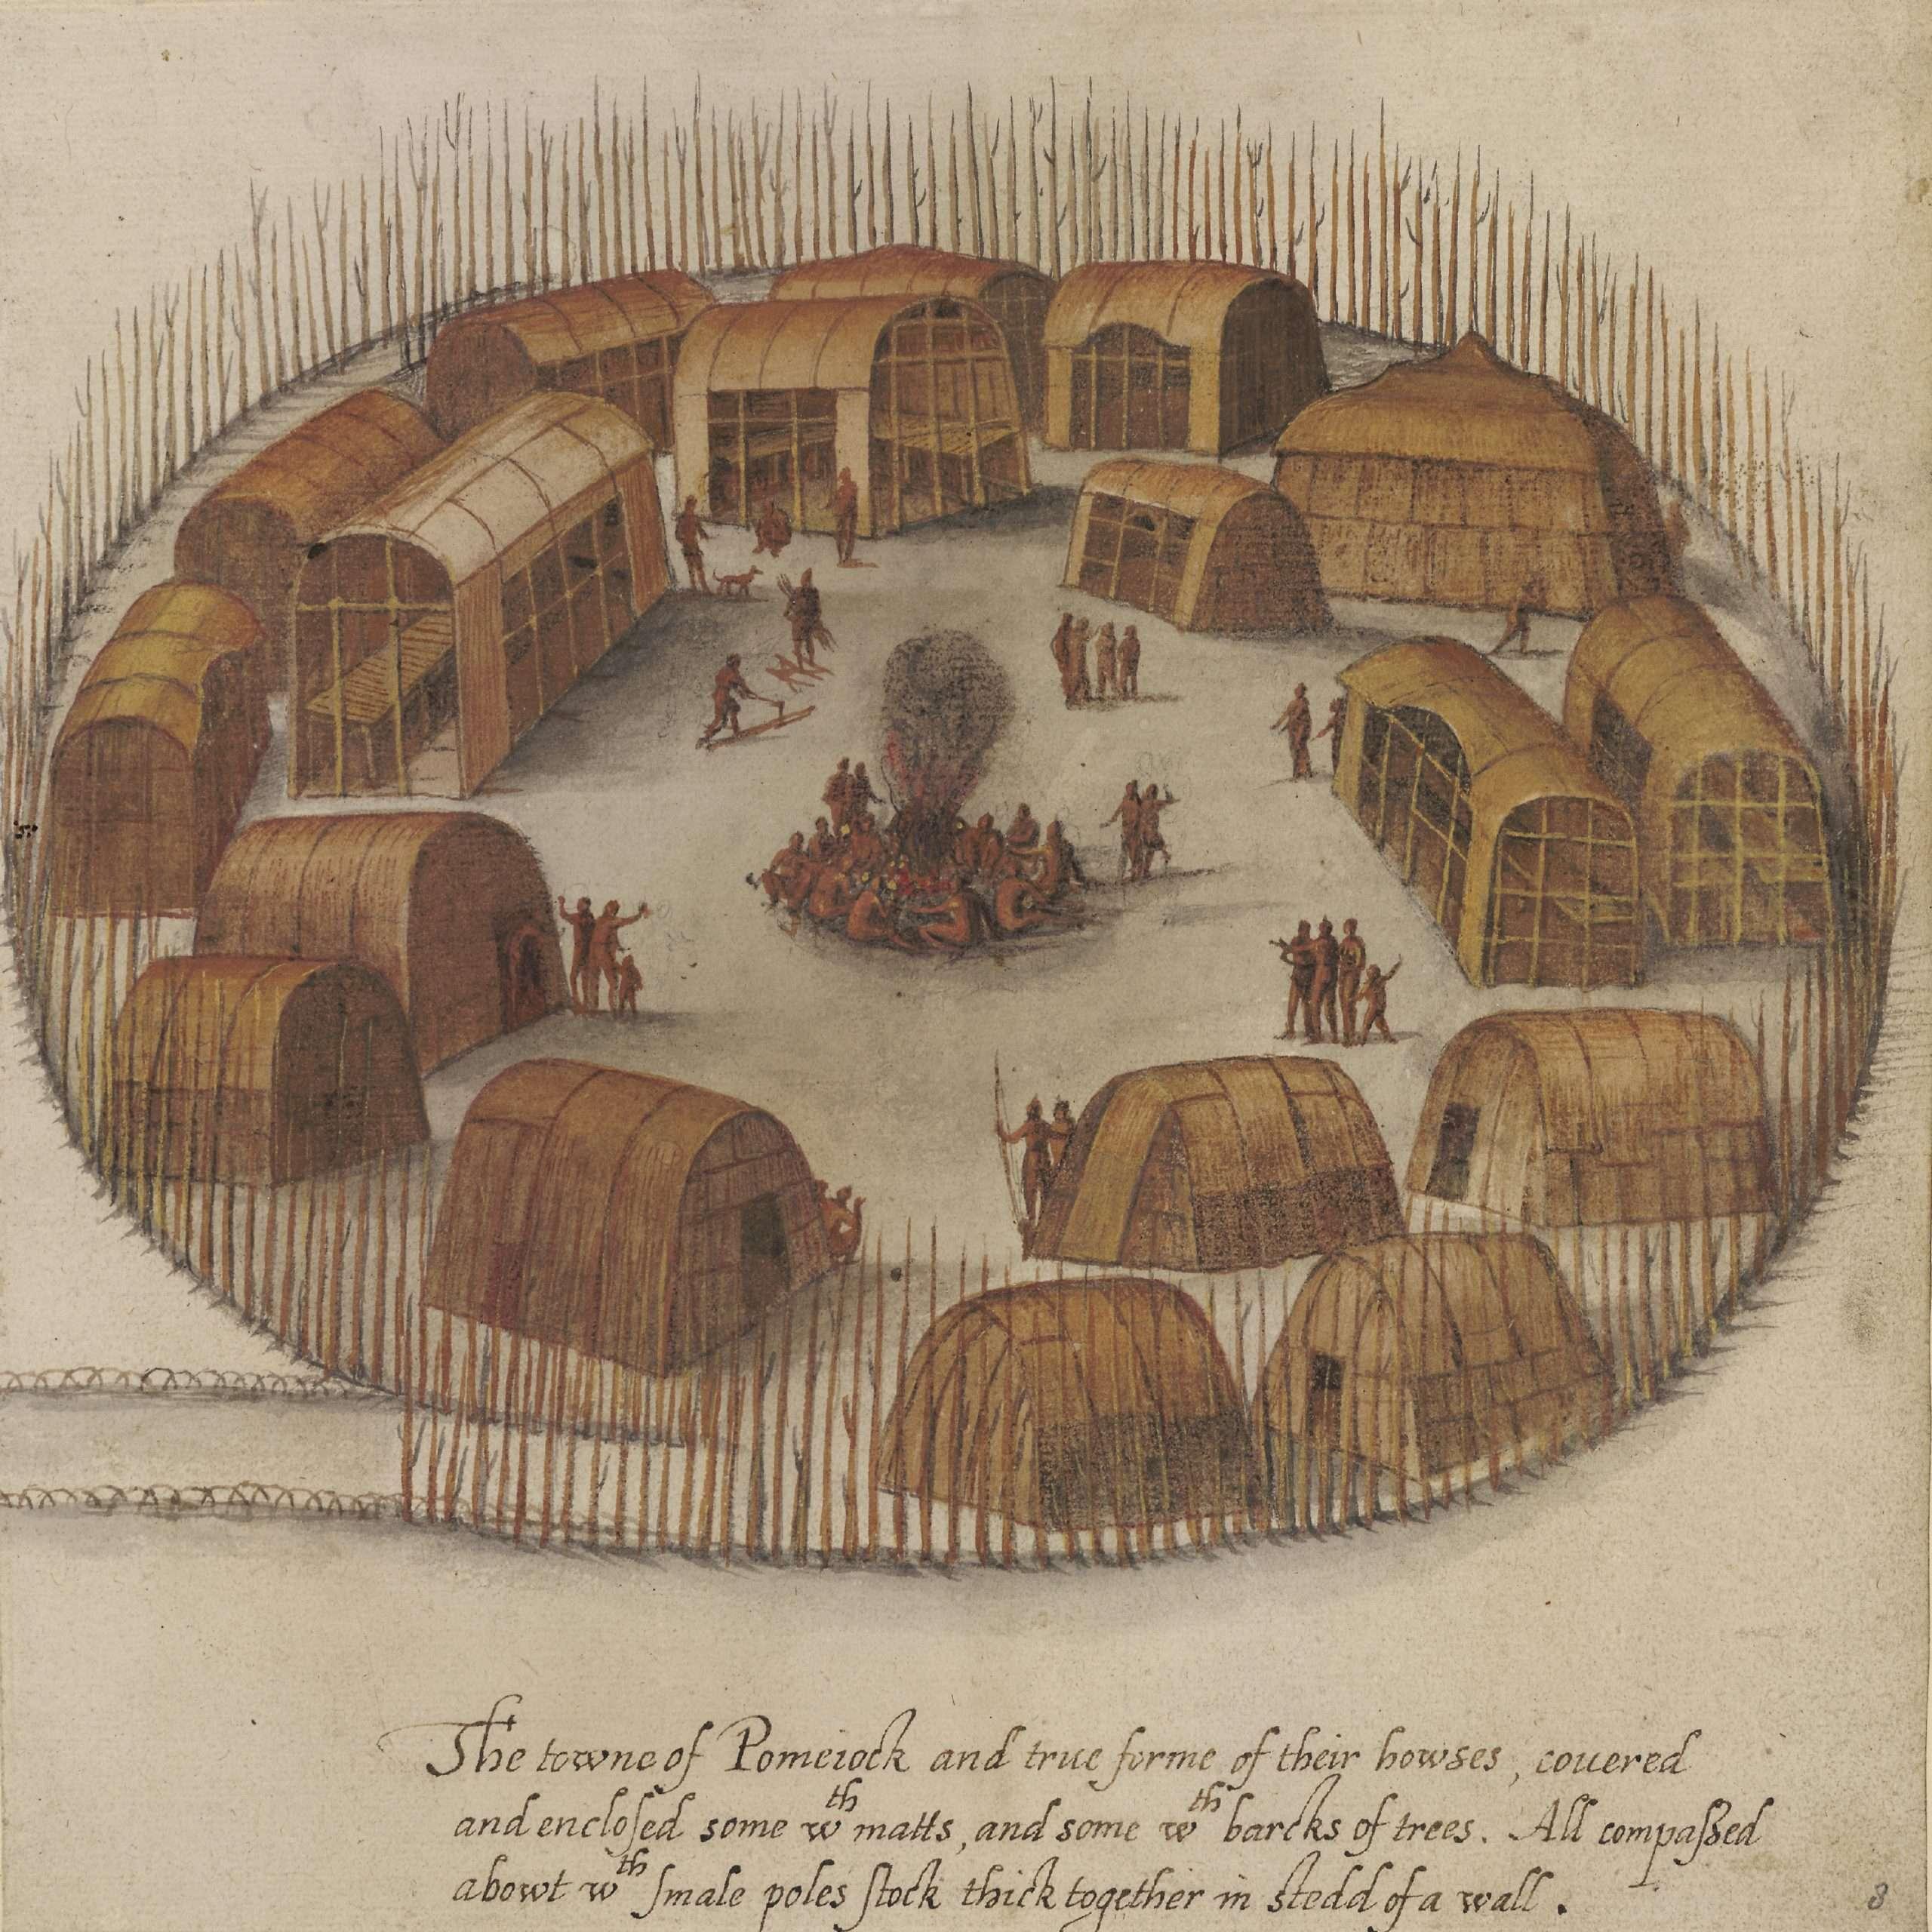 The towne of Pomeiock